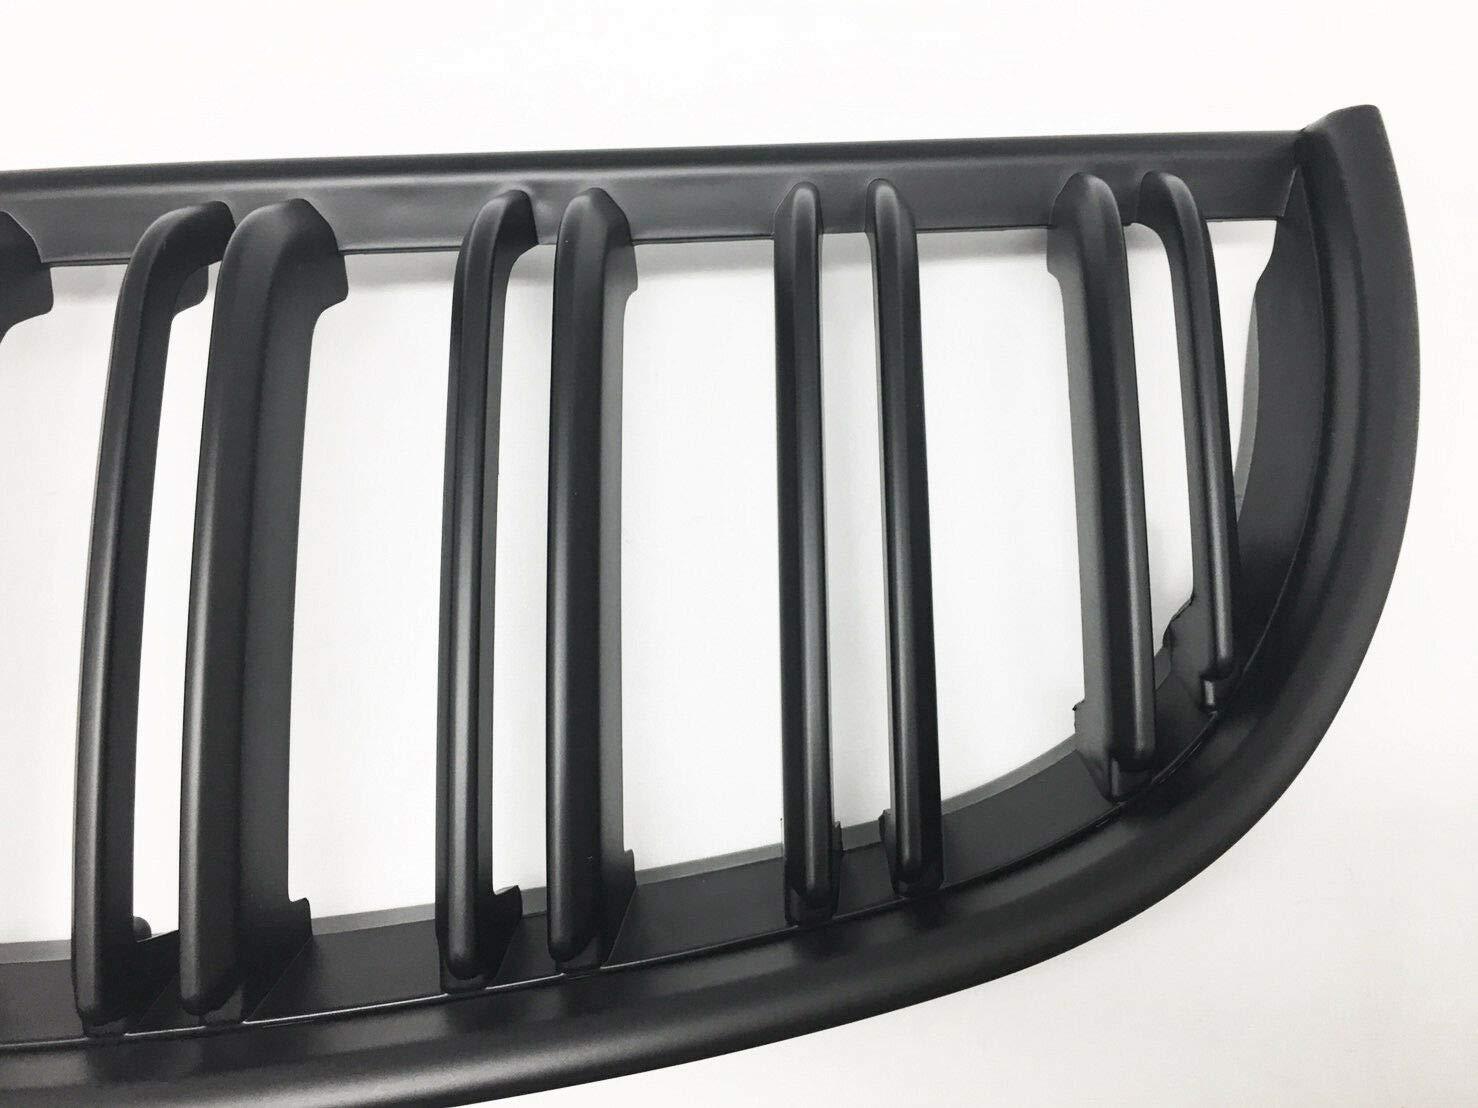 color negro mate Parrillas delanteras para ri/ñ/ón deportivo E90 318 320i 325i 330i 04-07